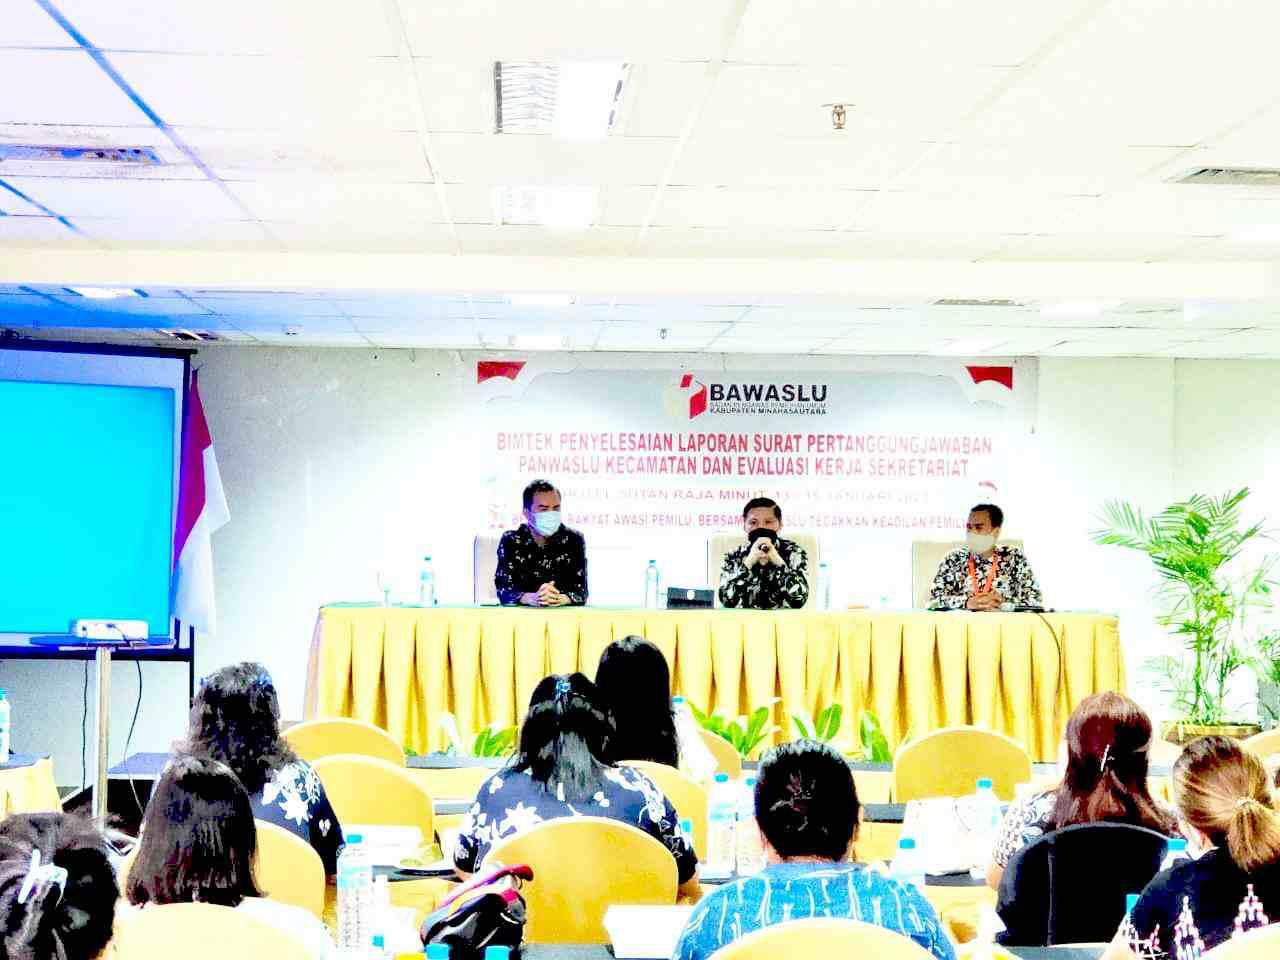 Panwaslu Kecamatan se-Minut Diingatkan Sinergi Laporkan SPJ